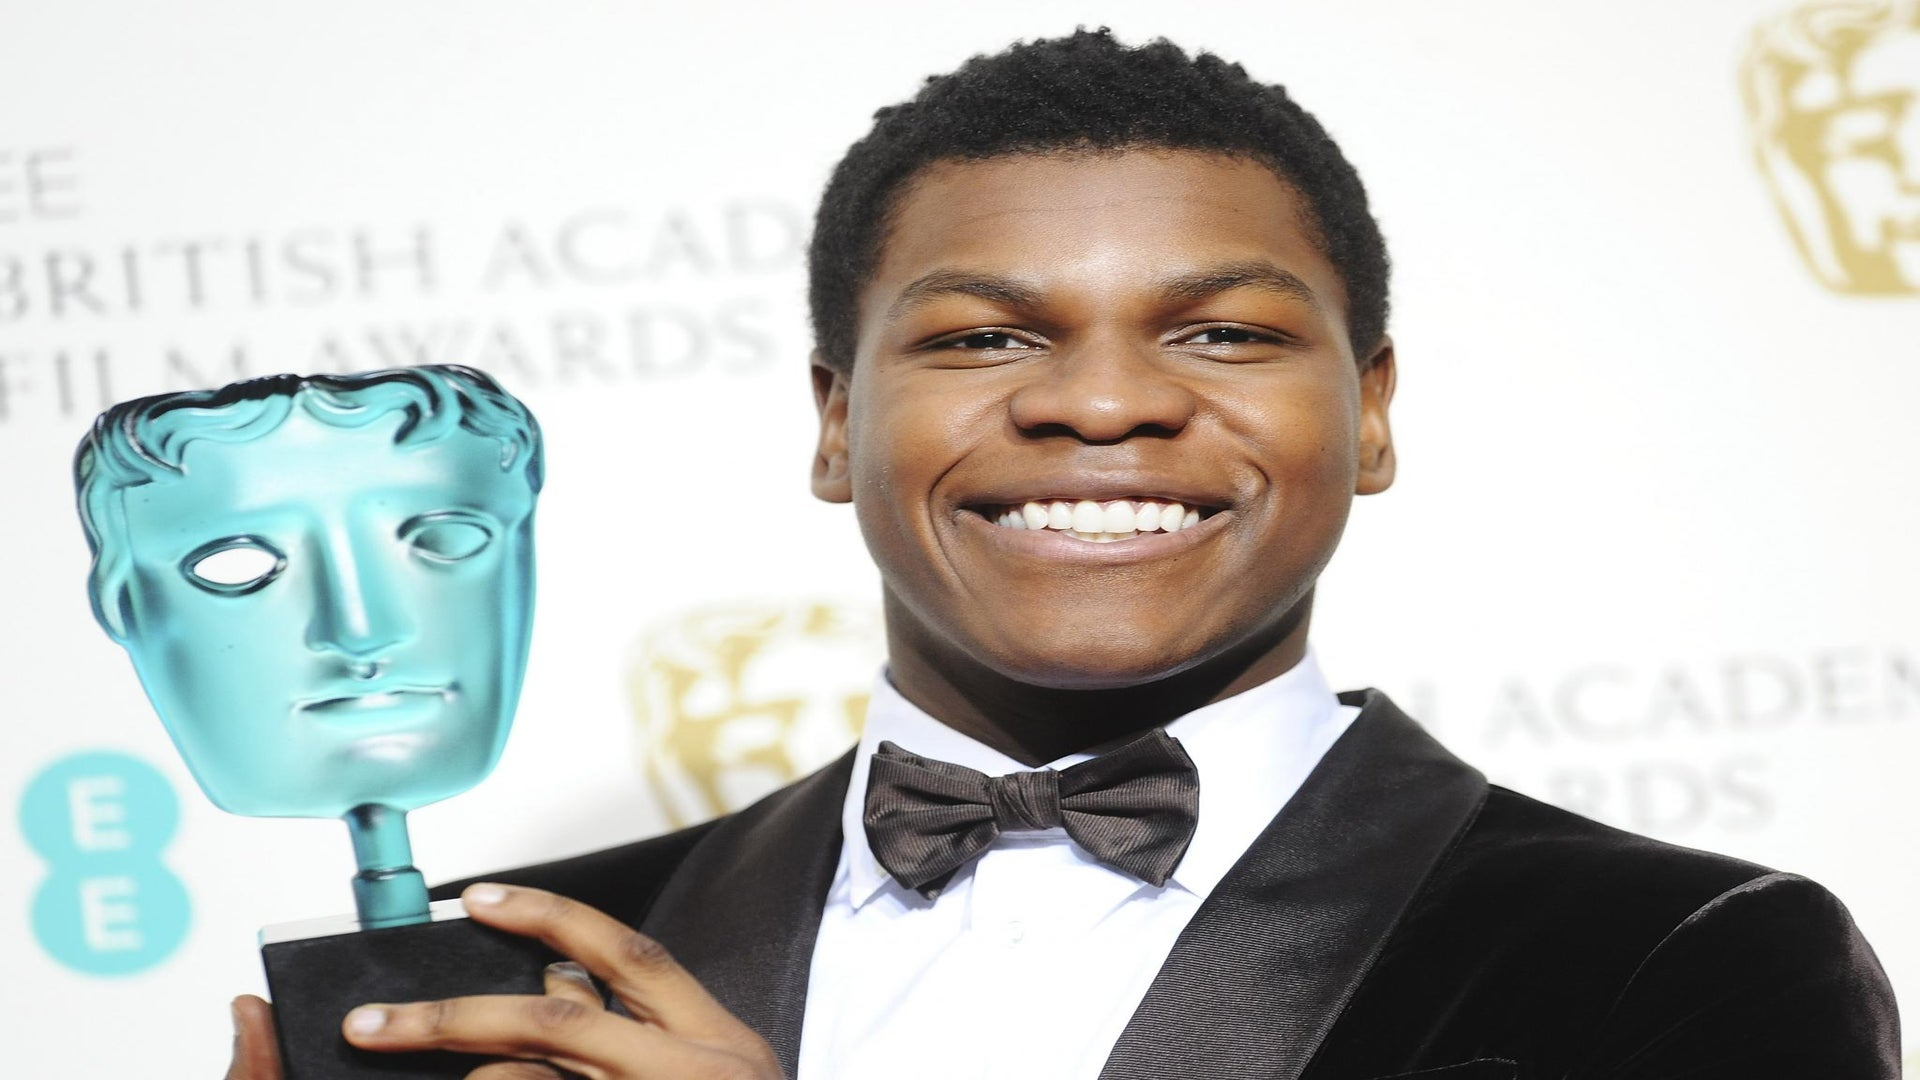 John Boyega Wins BAFTA Award and Goes Straight To Work on Next 'Star Wars'